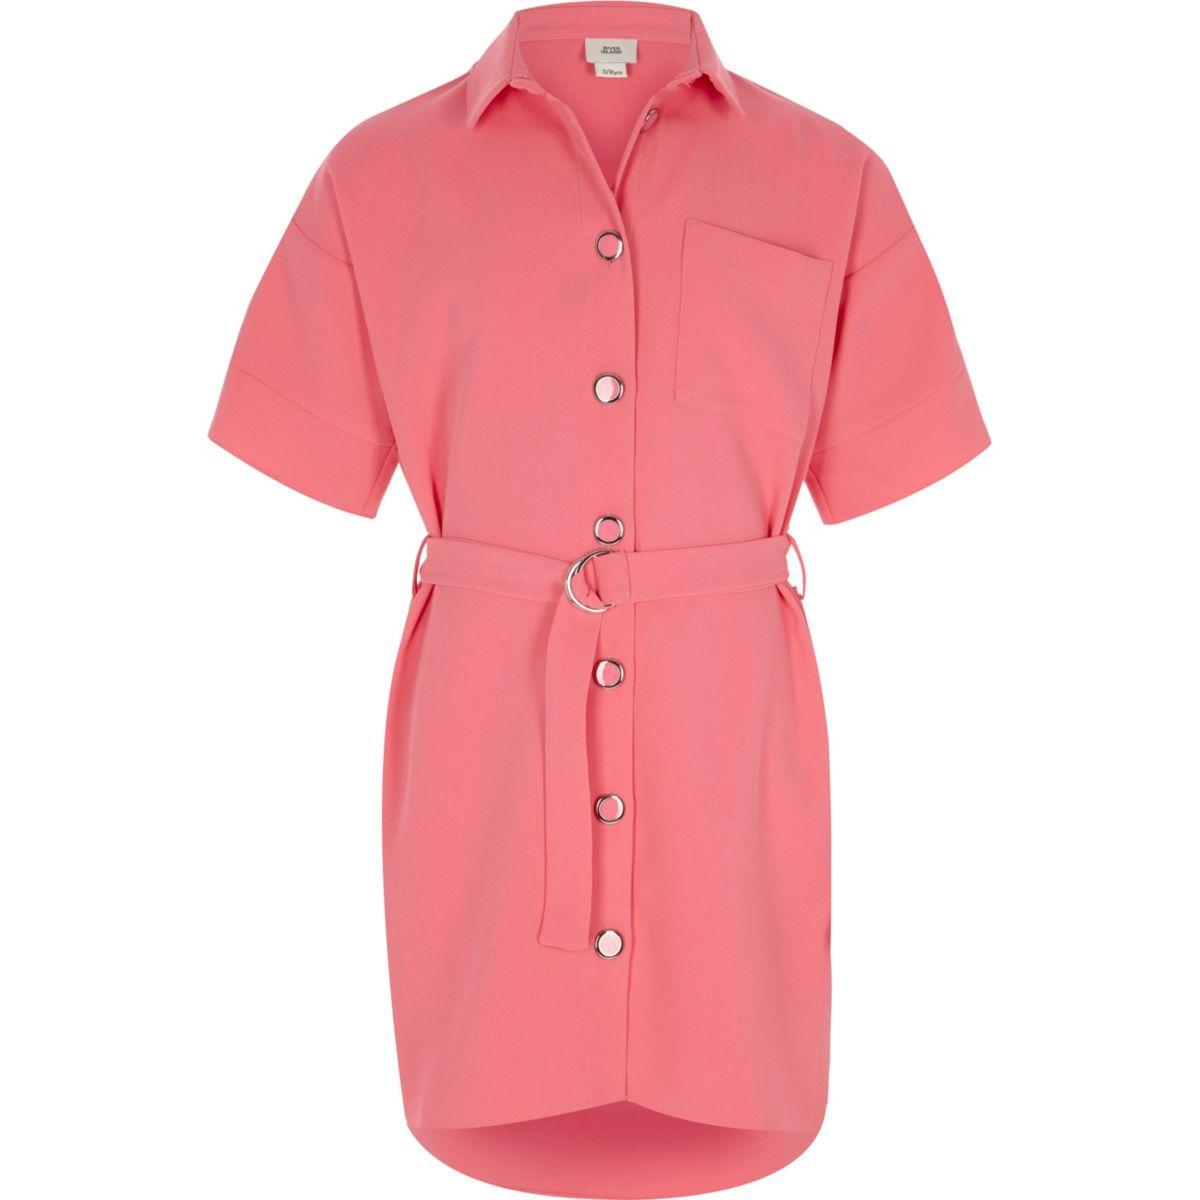 Girls pink belted military shirt dress